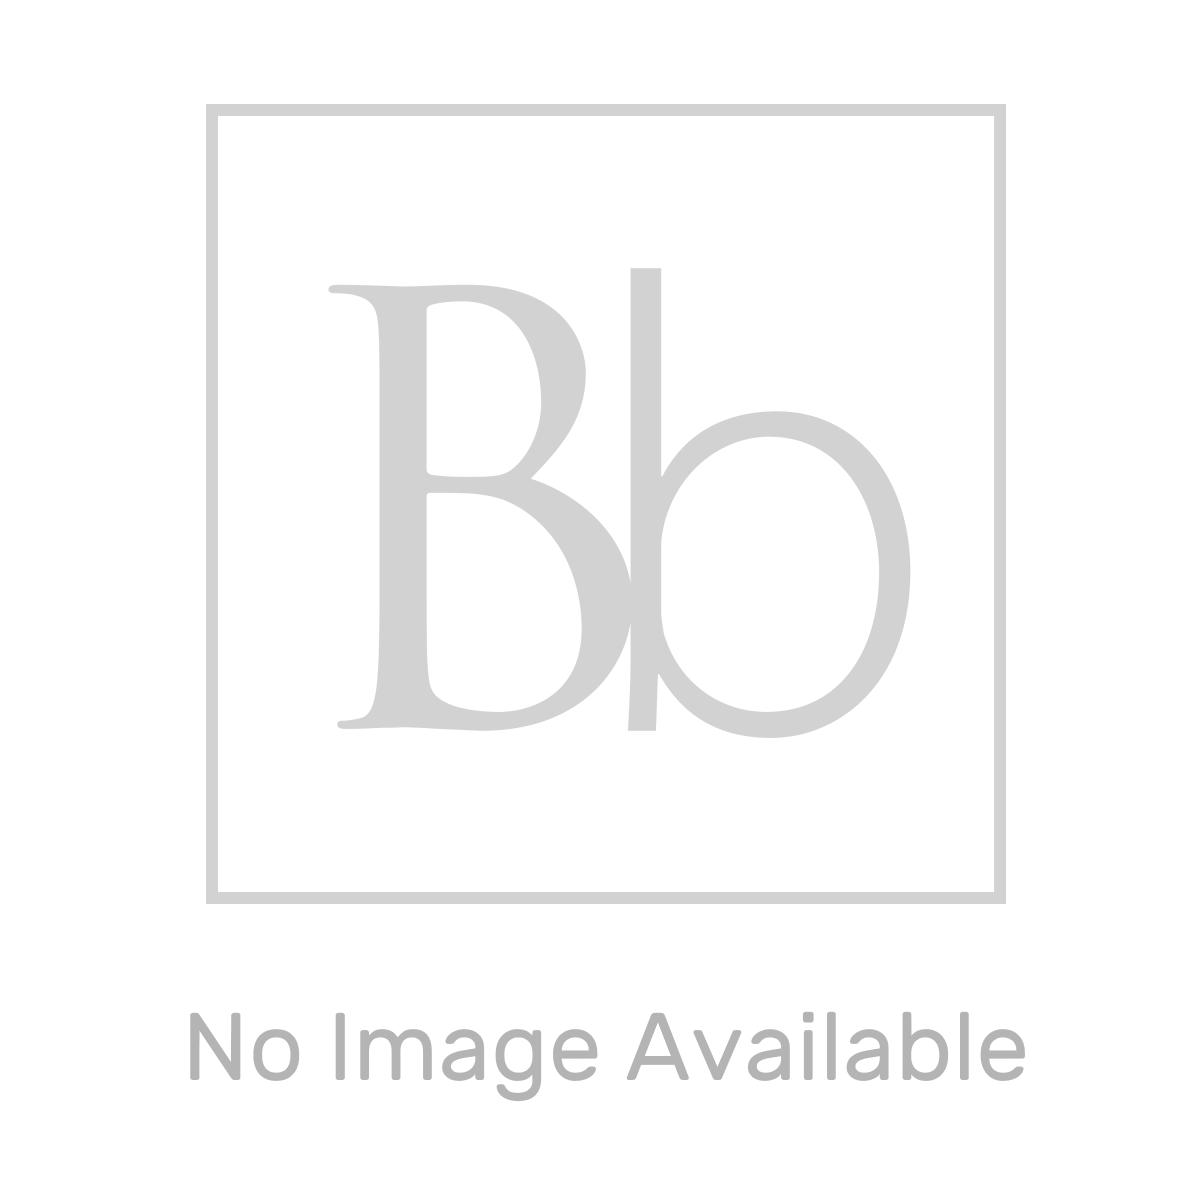 Aquadart Black Slate Shower Tray 1400 x 760 Lifestyle